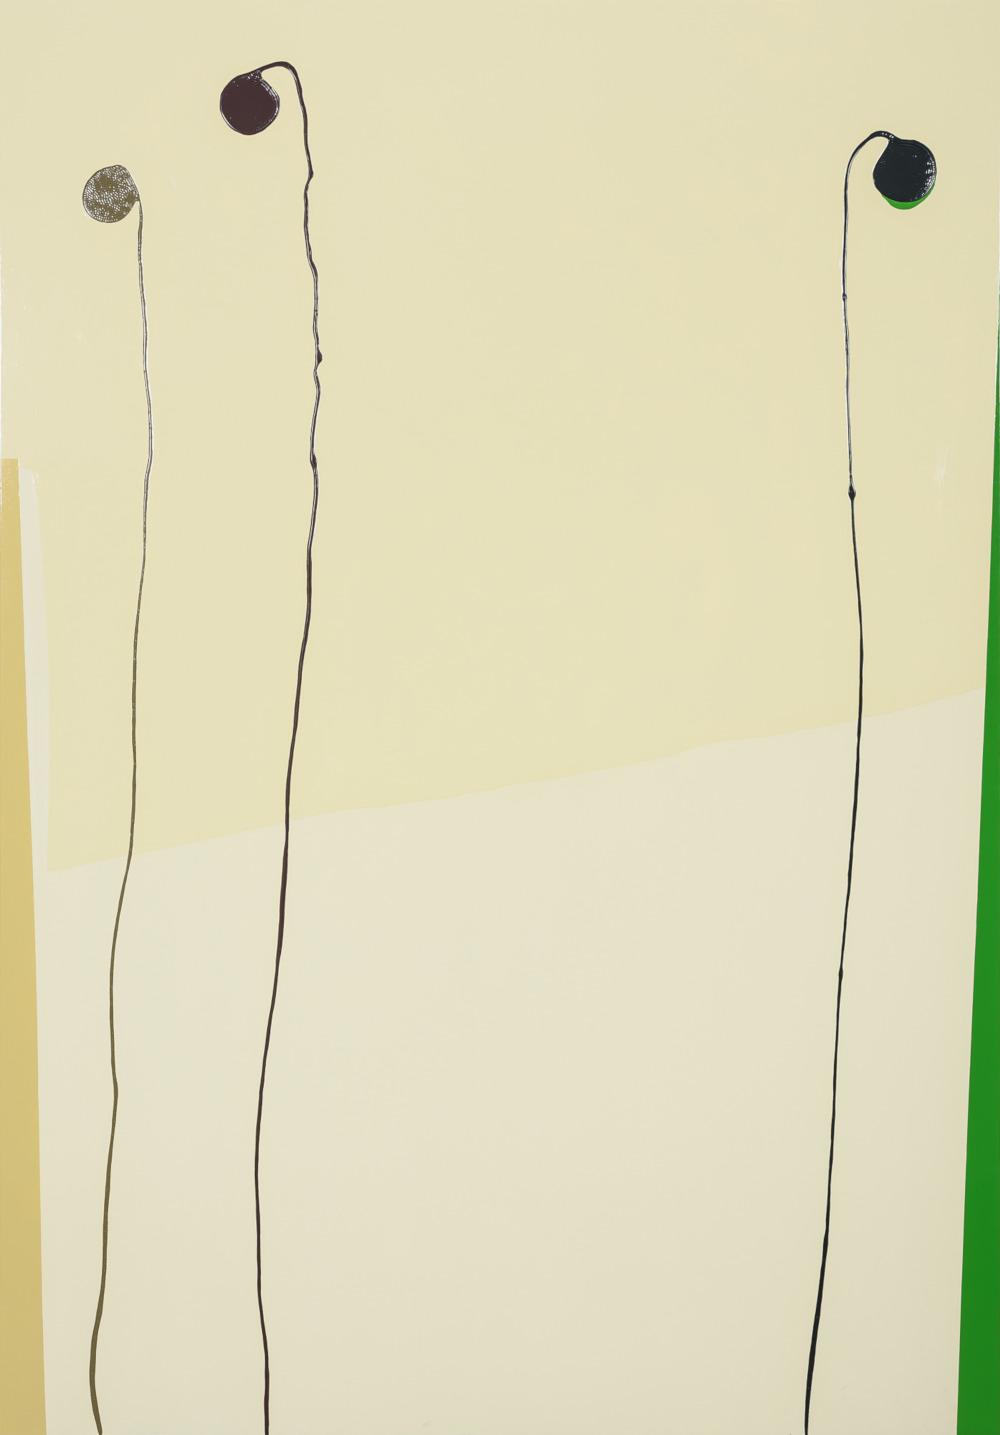 Gary Hume, Untitled, 2019